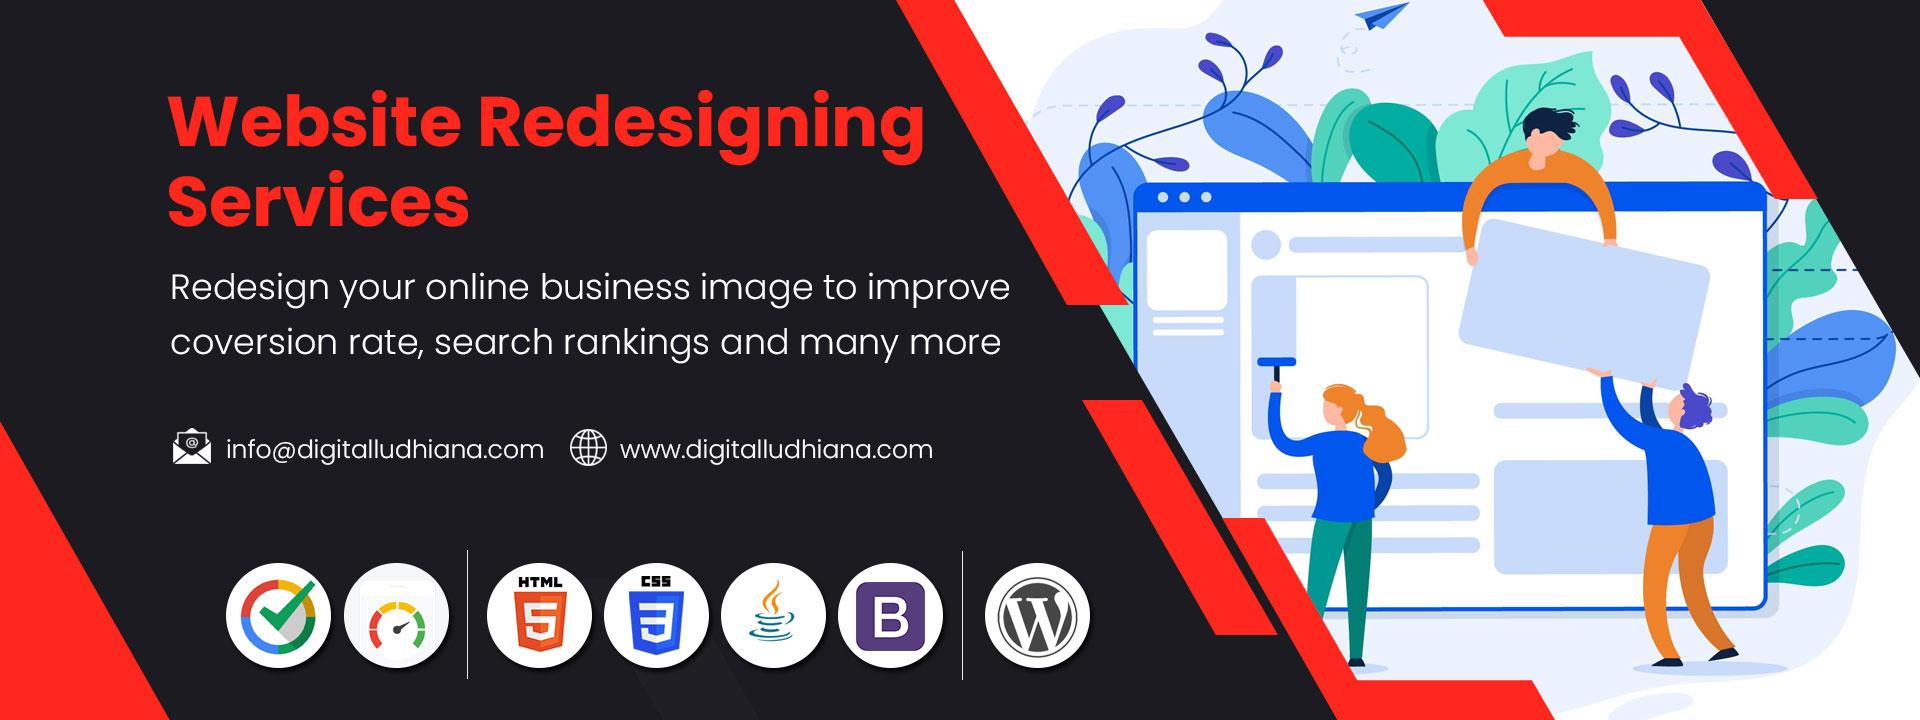 website redesigning services in ludhiana punjab india